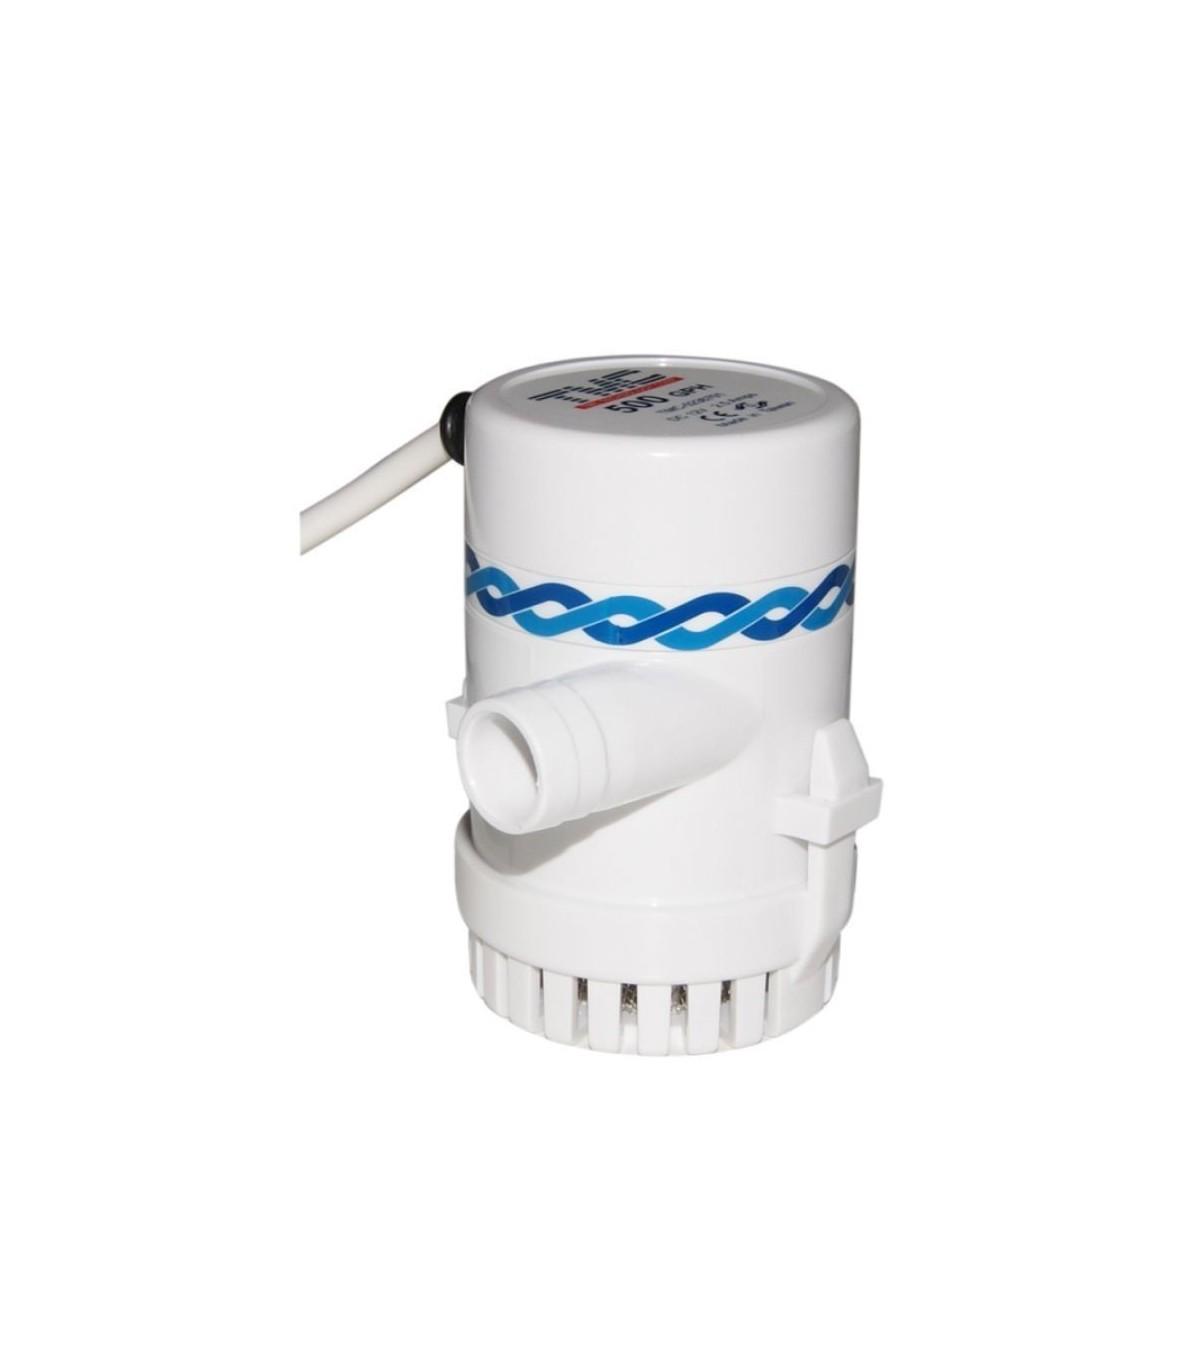 JICHUIO 3.5MM Aux Input Adaptor Cable Lead For Renault Megane Laguna Scenic iPhone